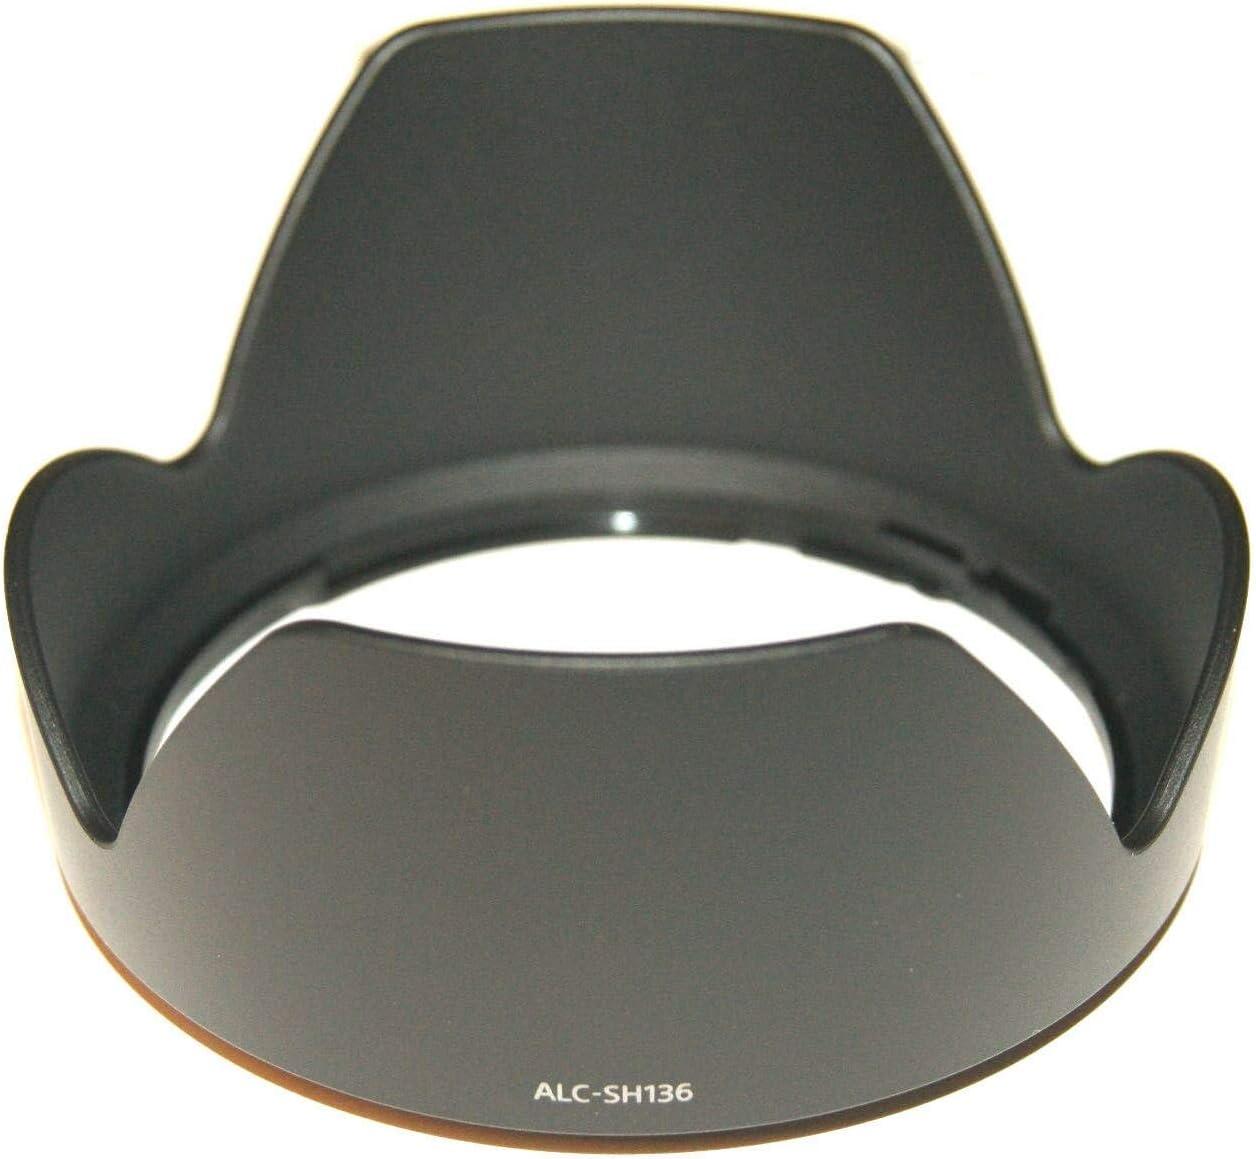 Hood ALC-SH136 Lens Protector for Sony APS SLR-Type Camera SEL24240 4-564-875-01 456487501